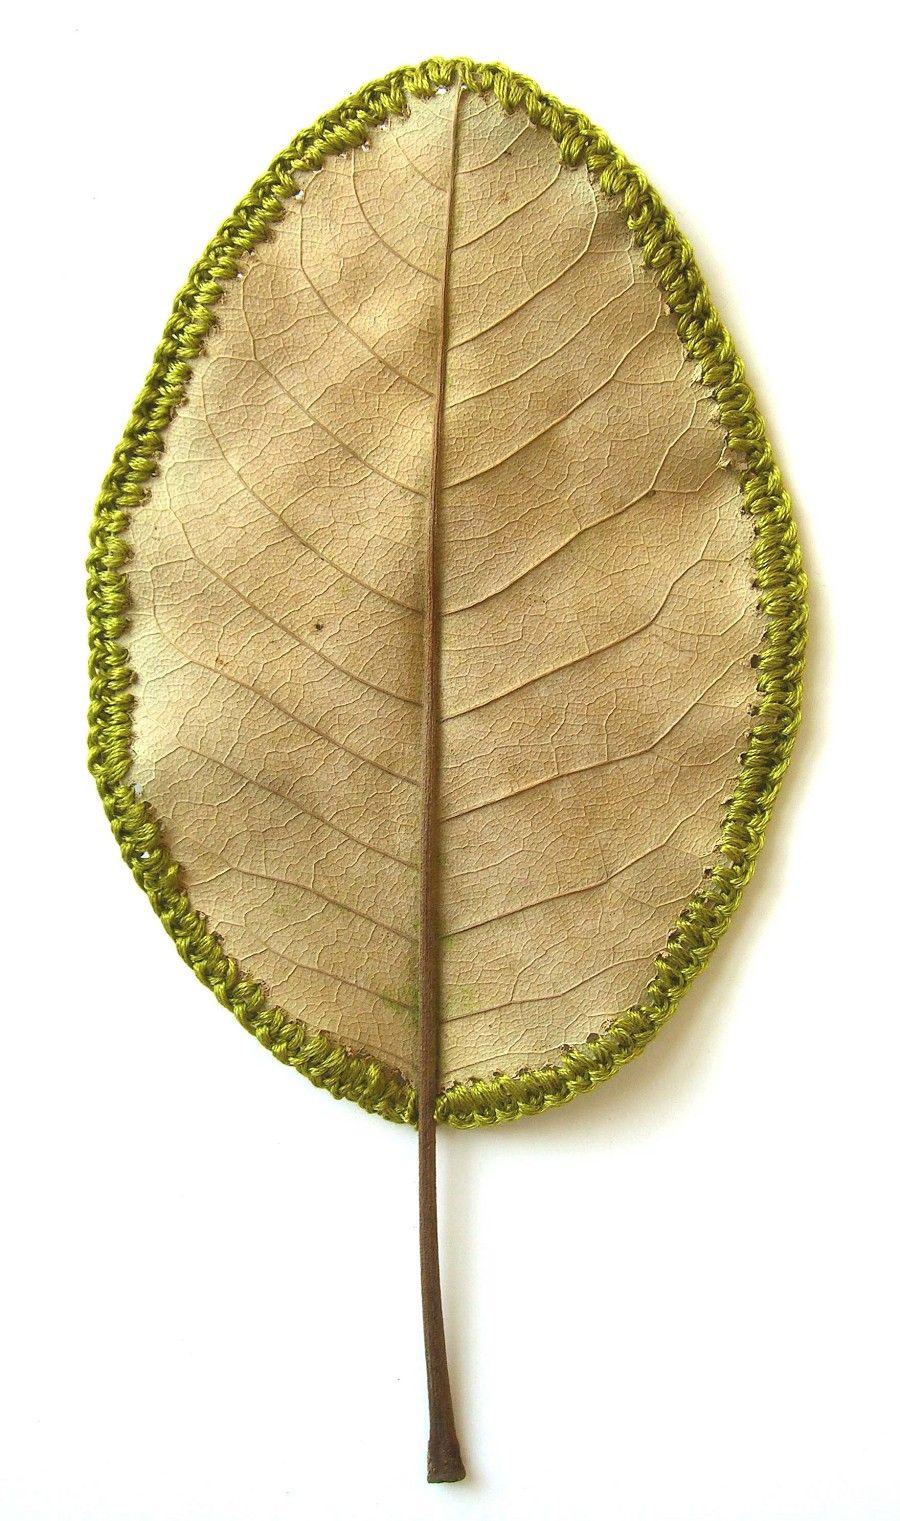 Beautiful! A magnolia leaf with crochet edge by Susanna Bauer.